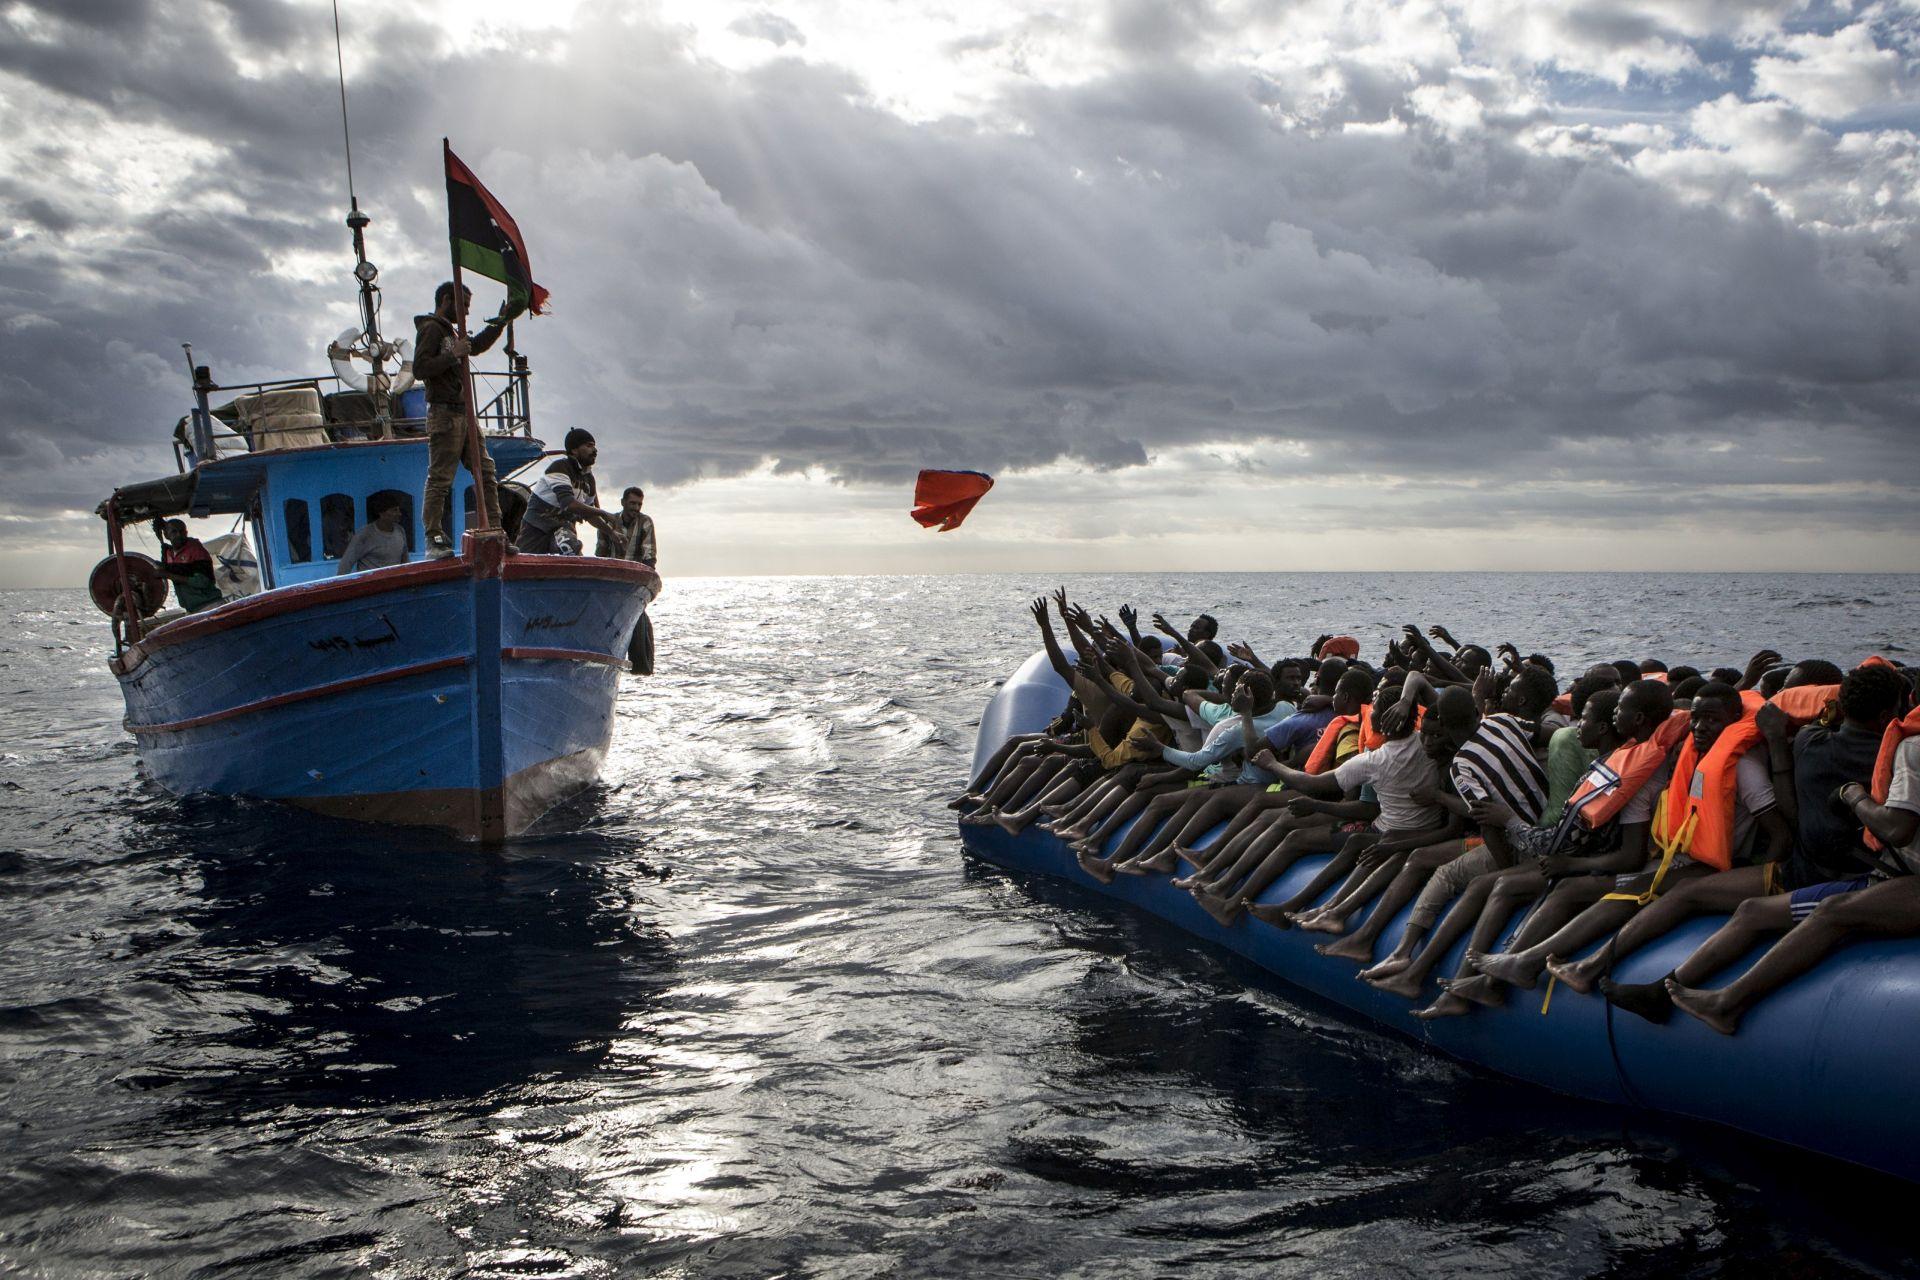 MIGRANTI Najmanje 15 ljudi utopilo se u potonuću čamca